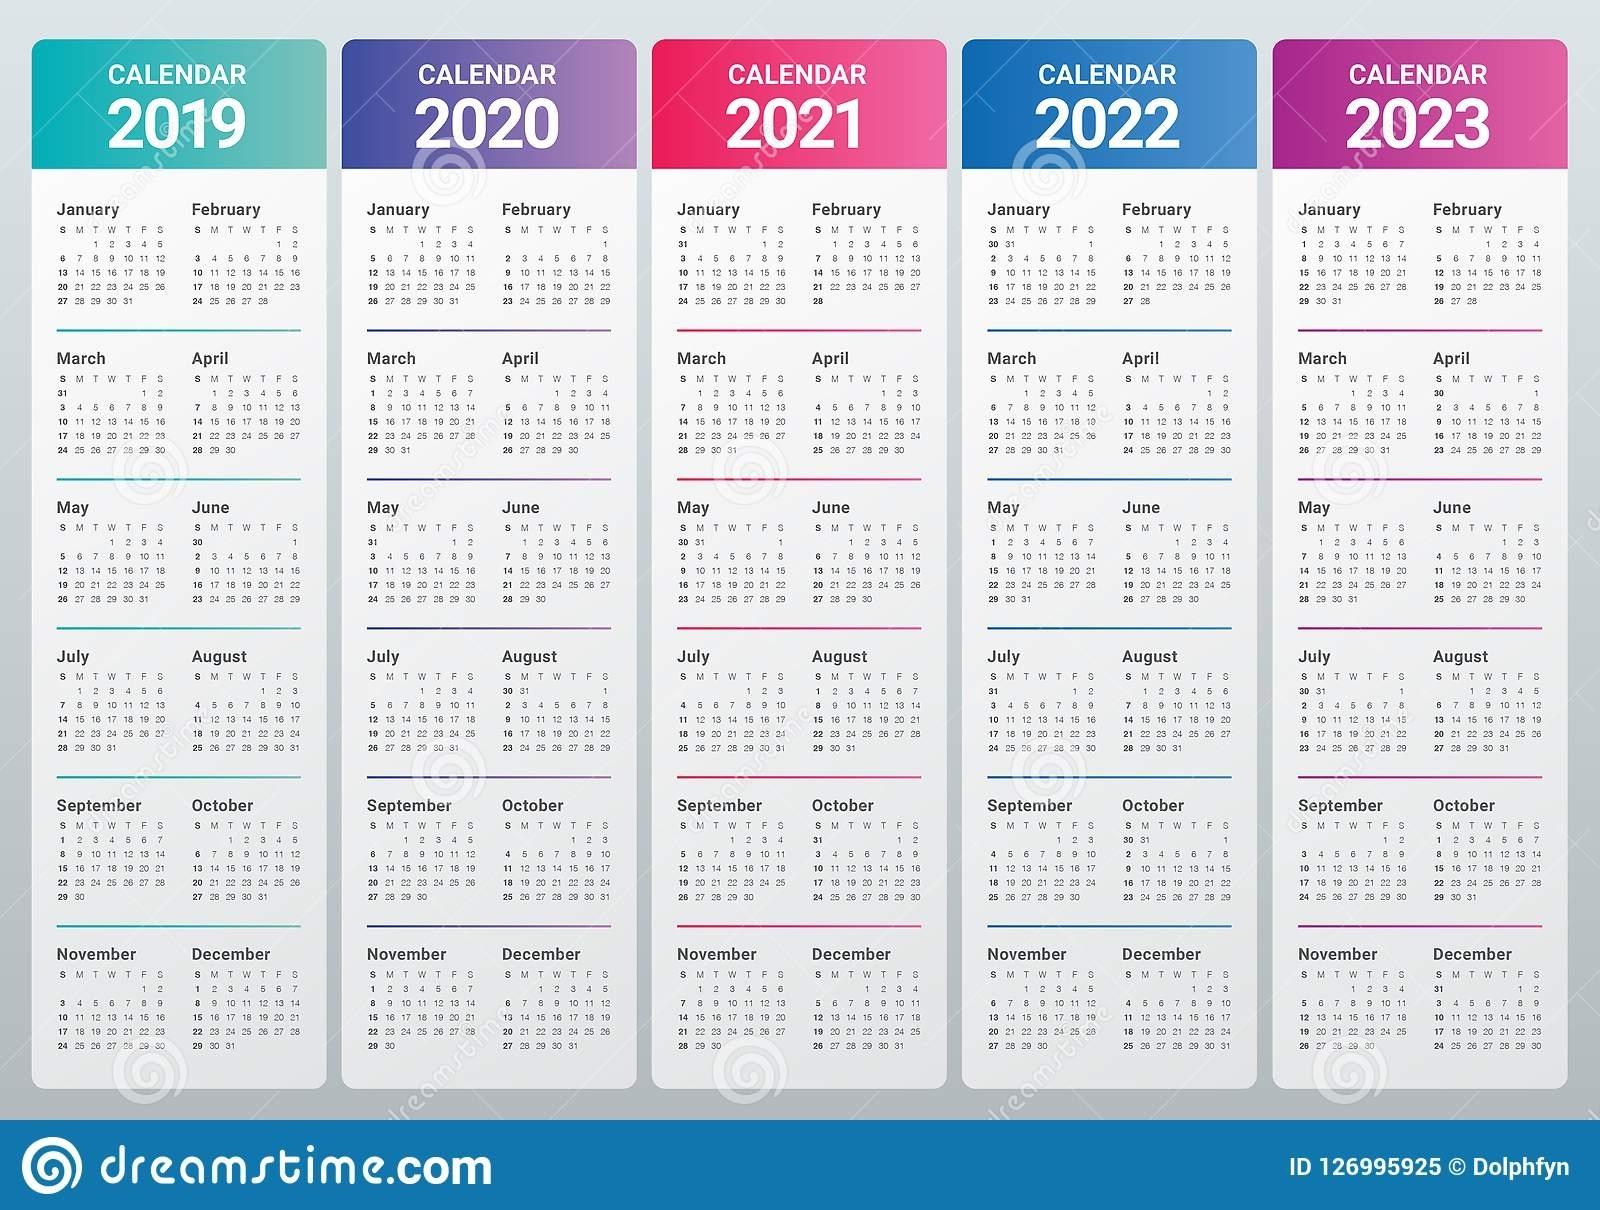 Year 2019 2020 2021 2022 2023 Calendar Vector Design 5 Year Calendar Template